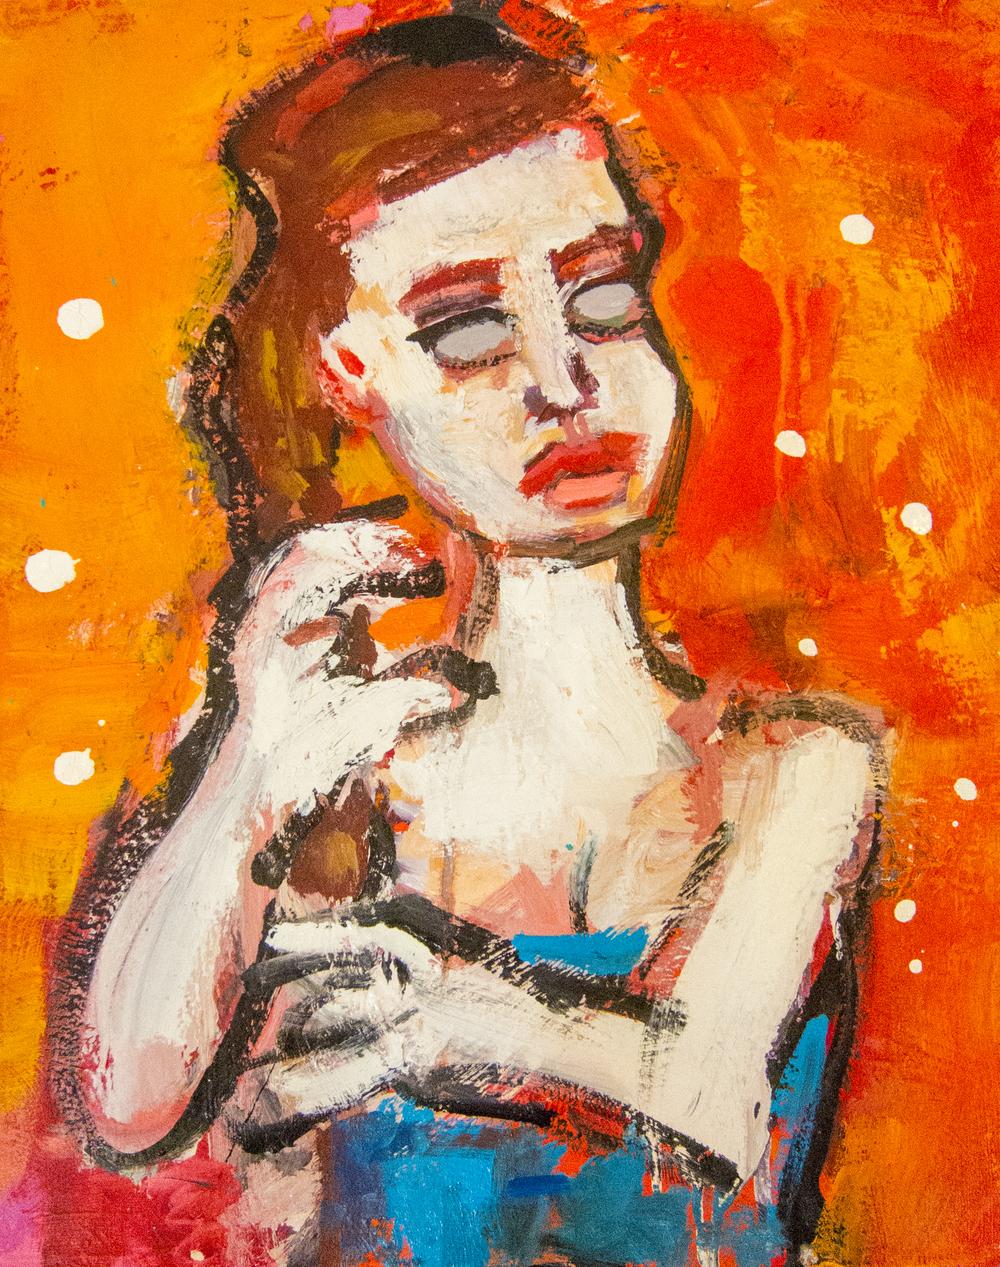 Woman With Orange Background by Greg Kessler